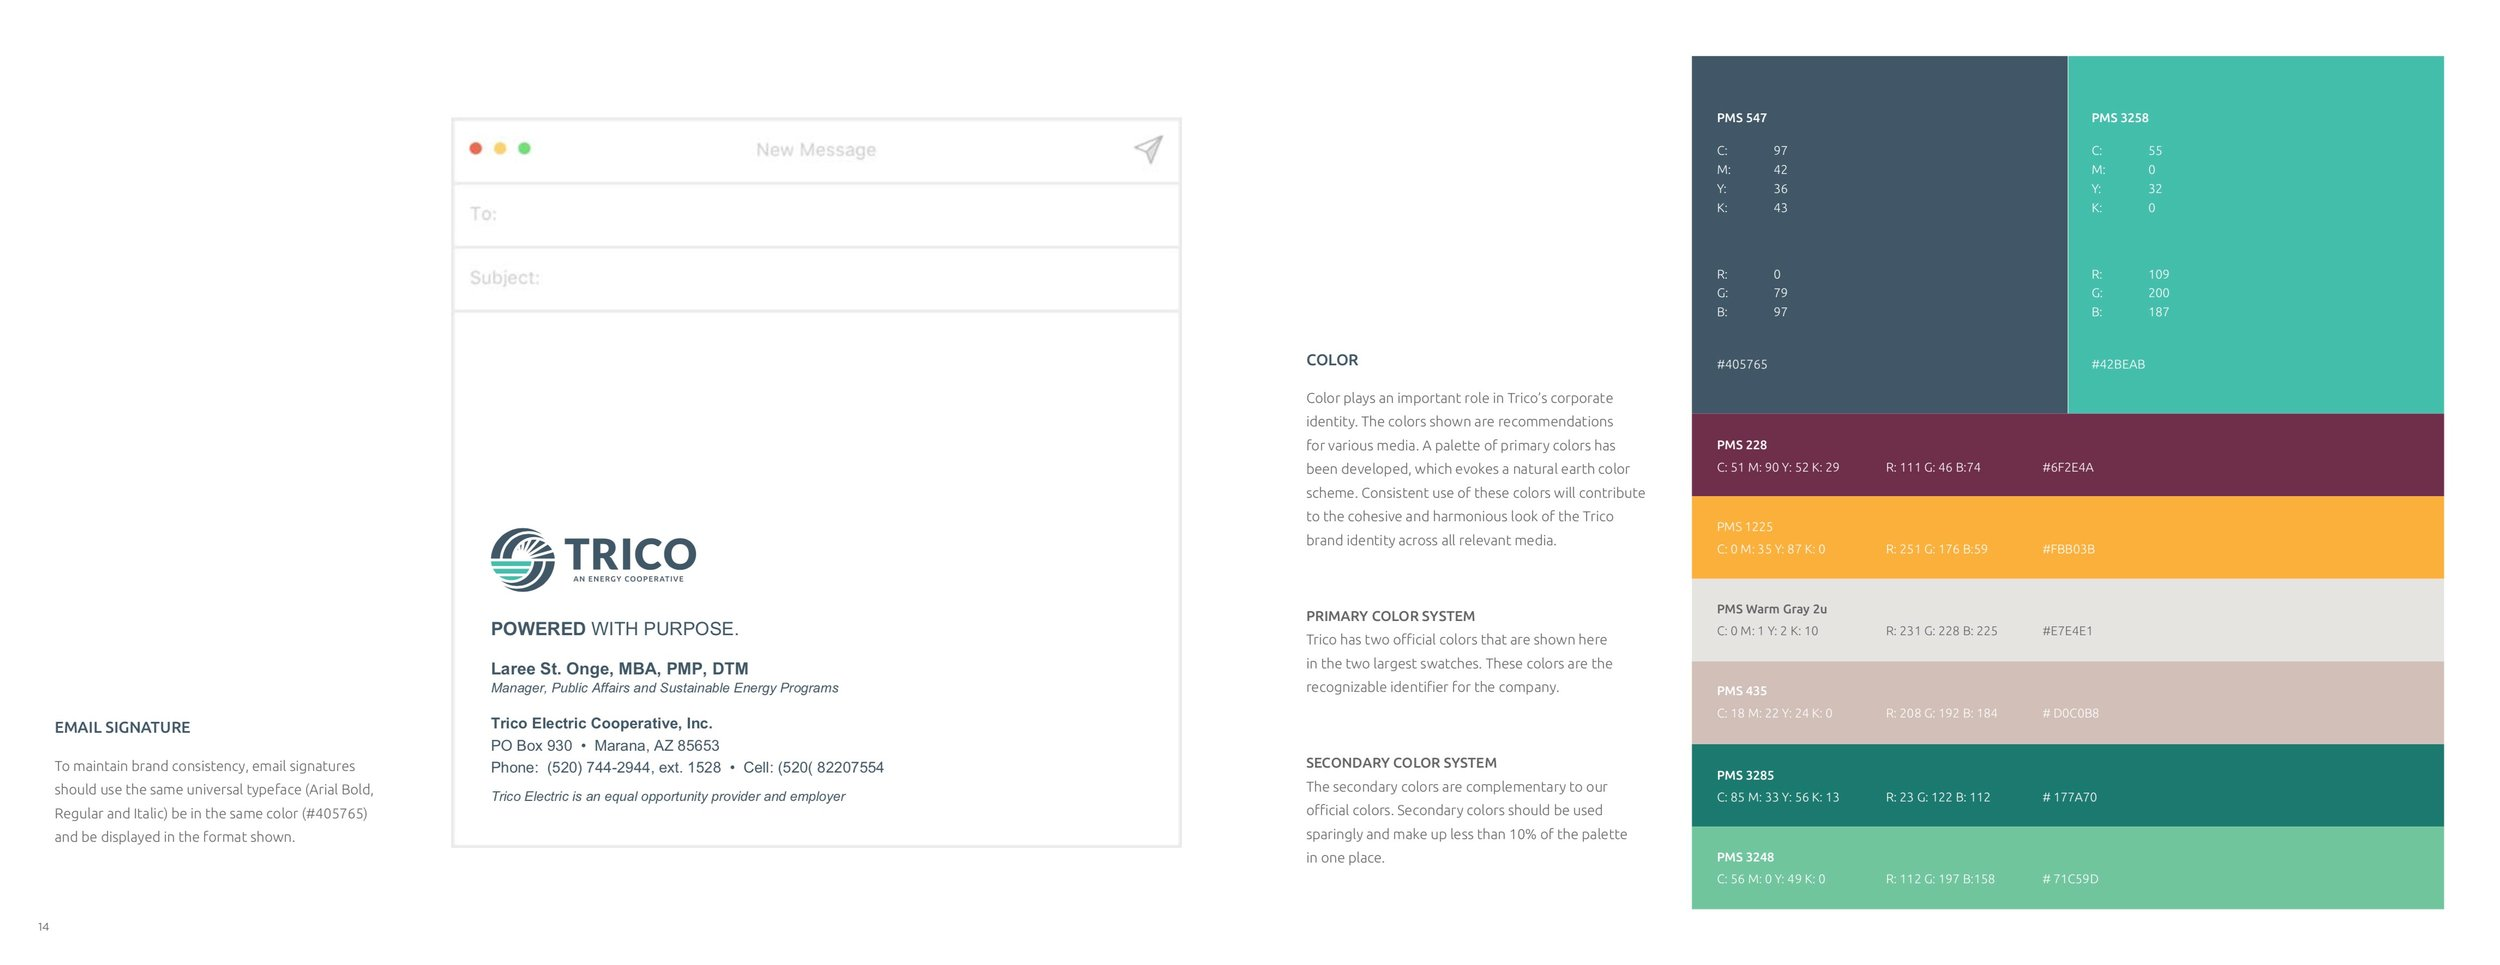 trico-brand-guidelines-2.jpg